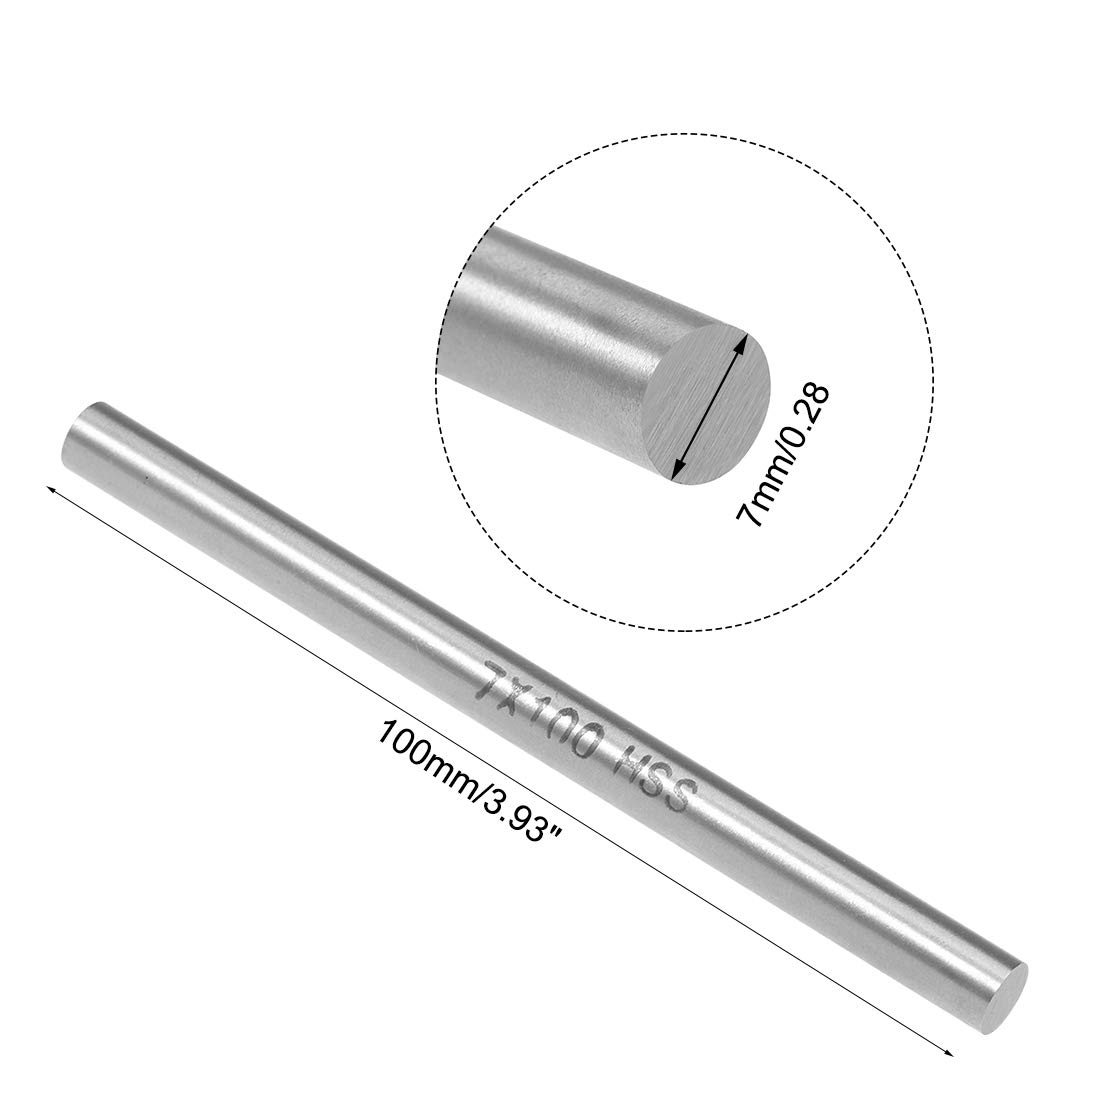 uxcell HSS Lathe Round Rod Solid Shaft Bar 7mm Dia 100mm Length 2Pcs